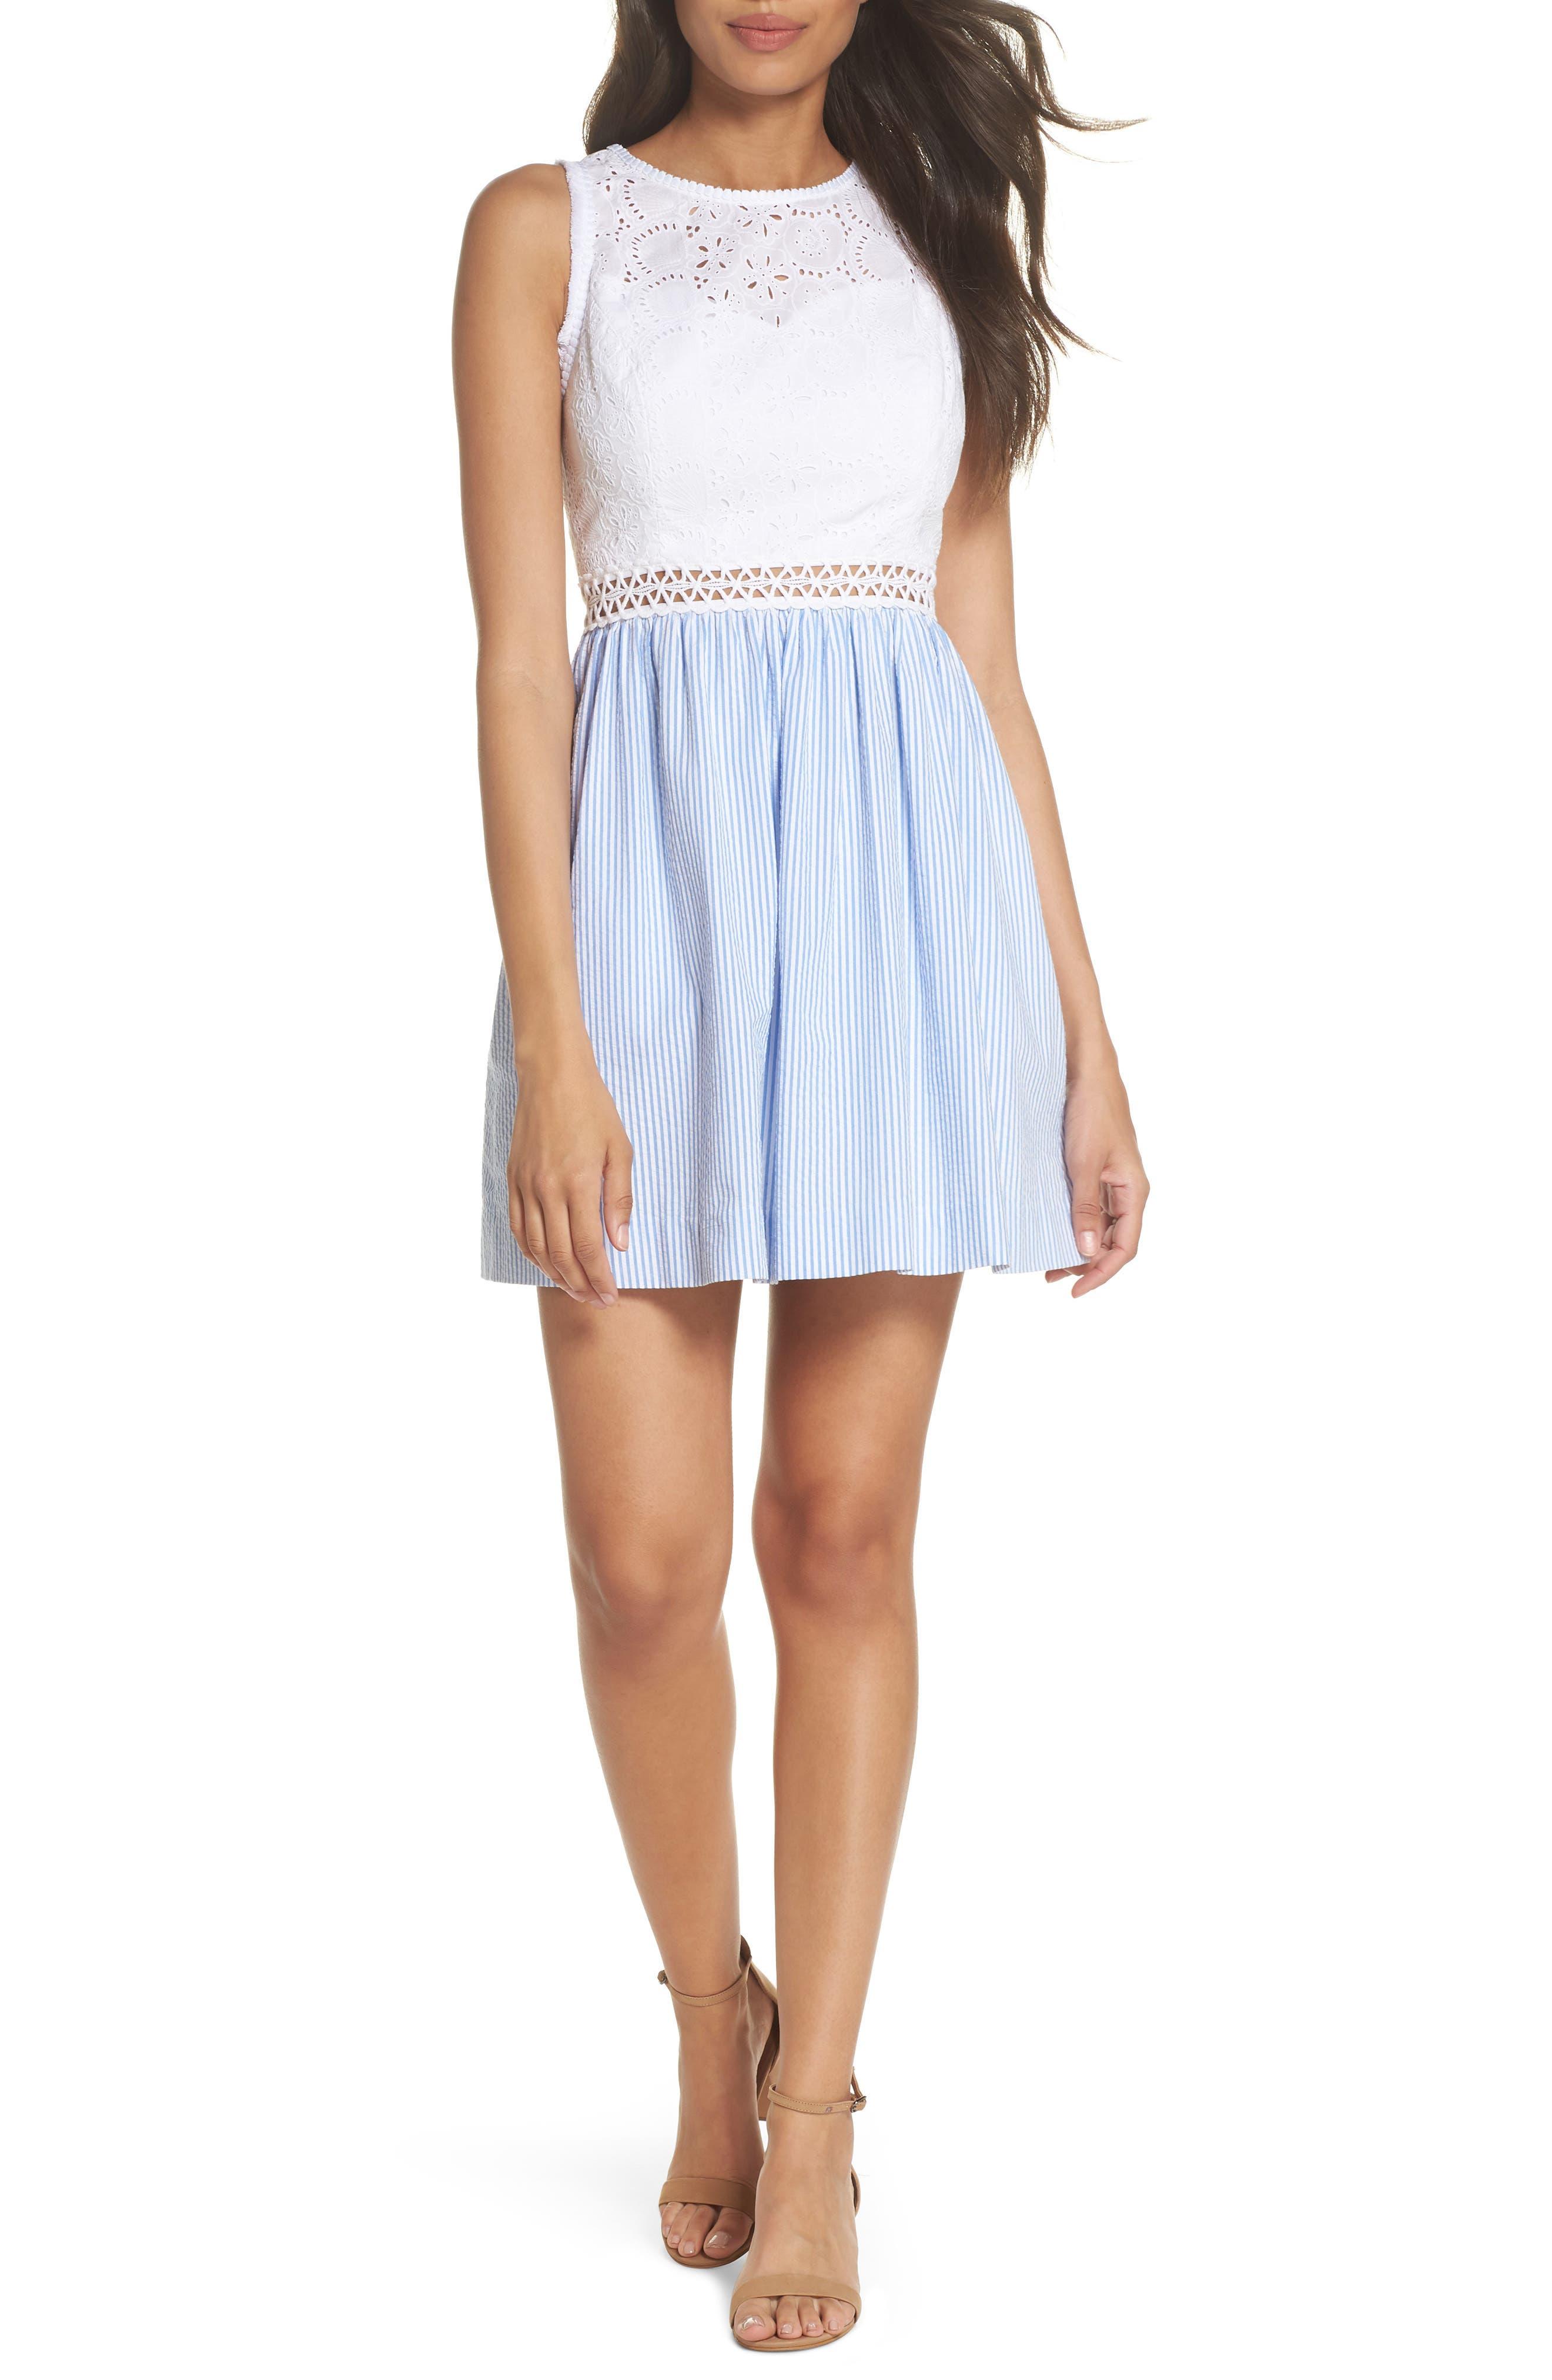 Lilly Pullitzer® Alivia Eyelet & Seersucker Fit & Flare Dress